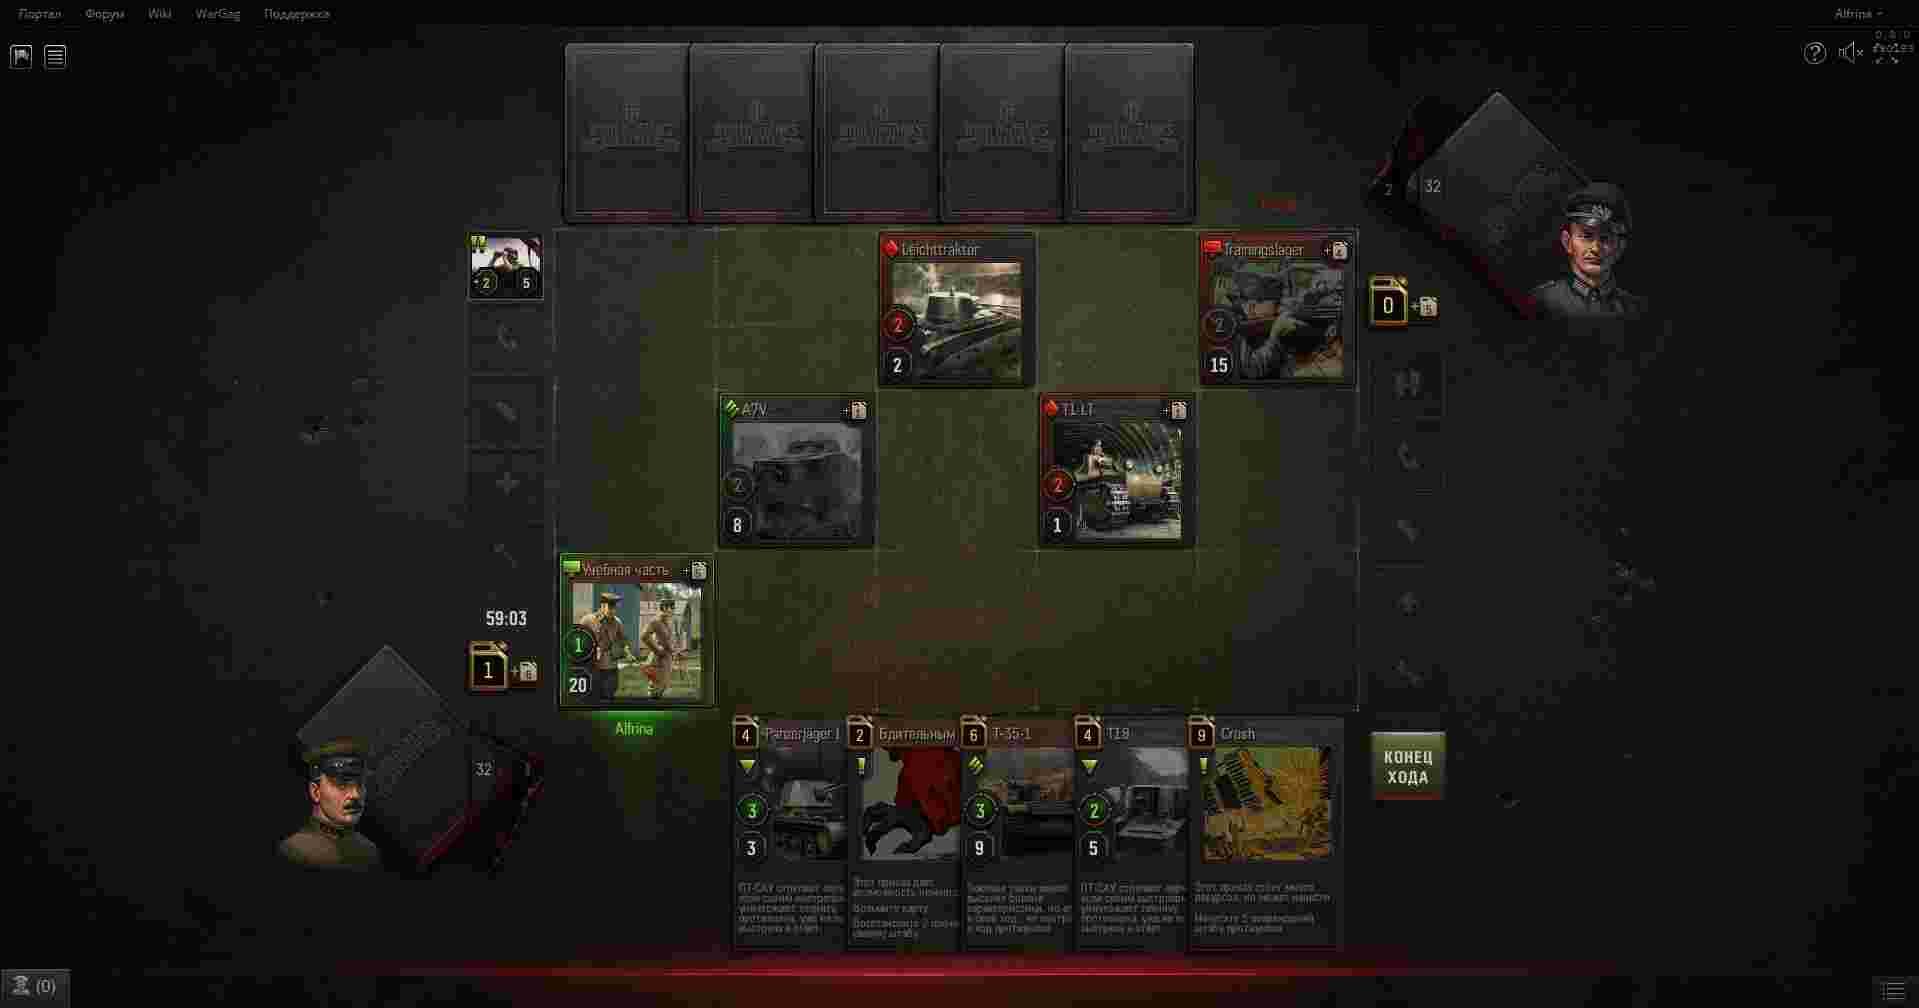 WoT_Generals_Screens_UI_Battle_Image_03